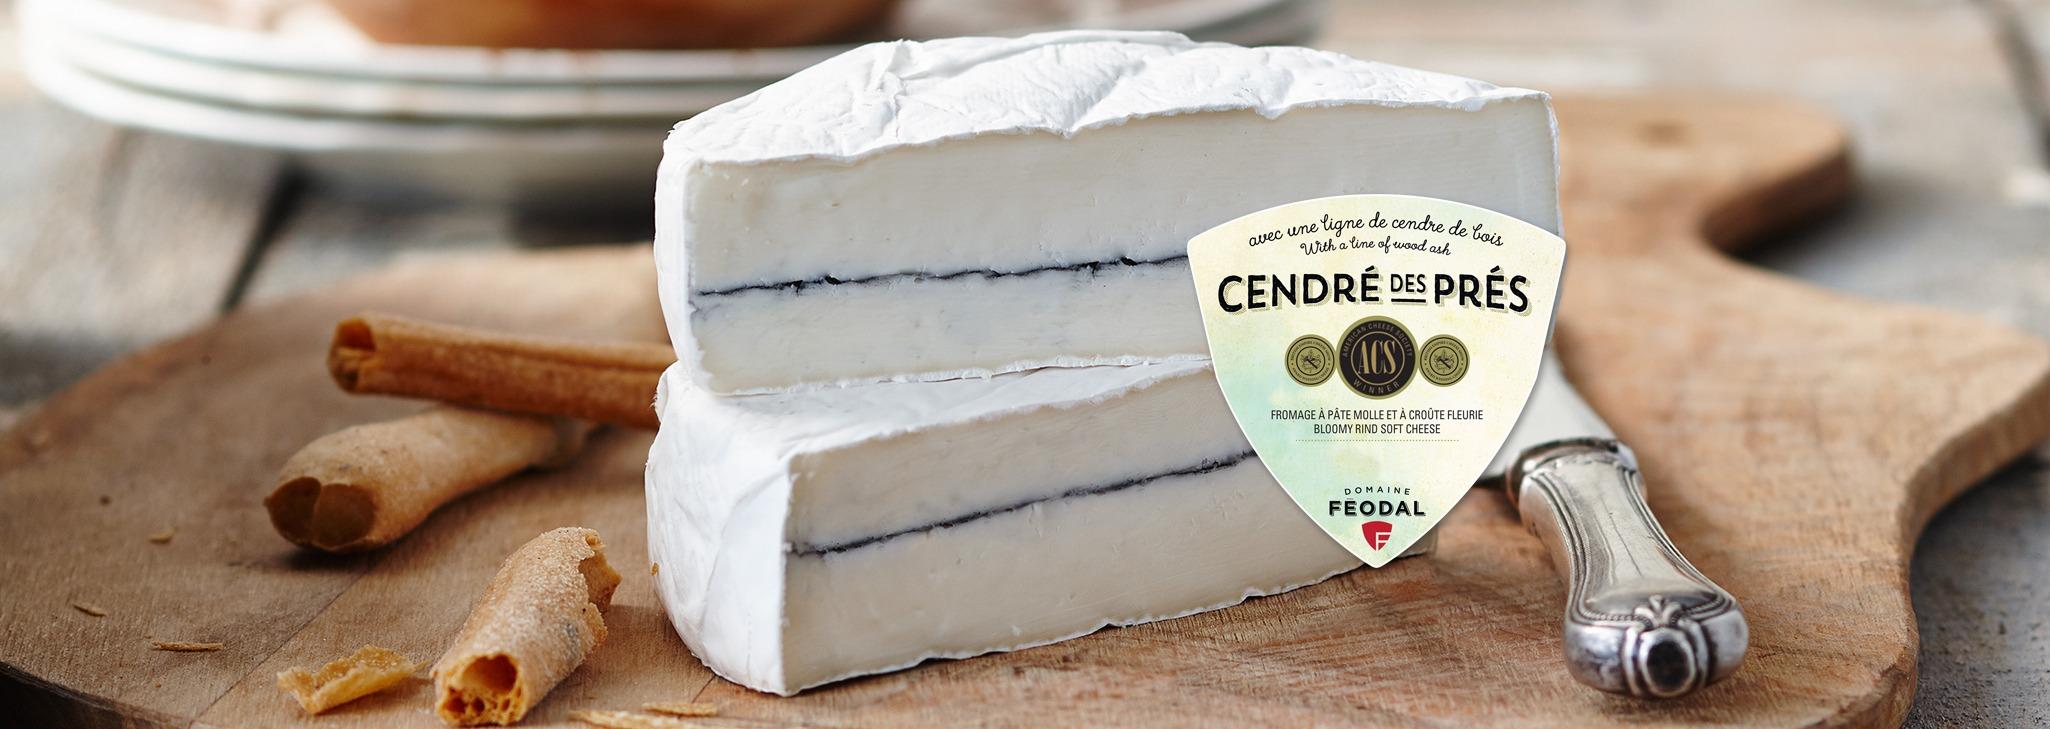 cendre-des-pres-fromage